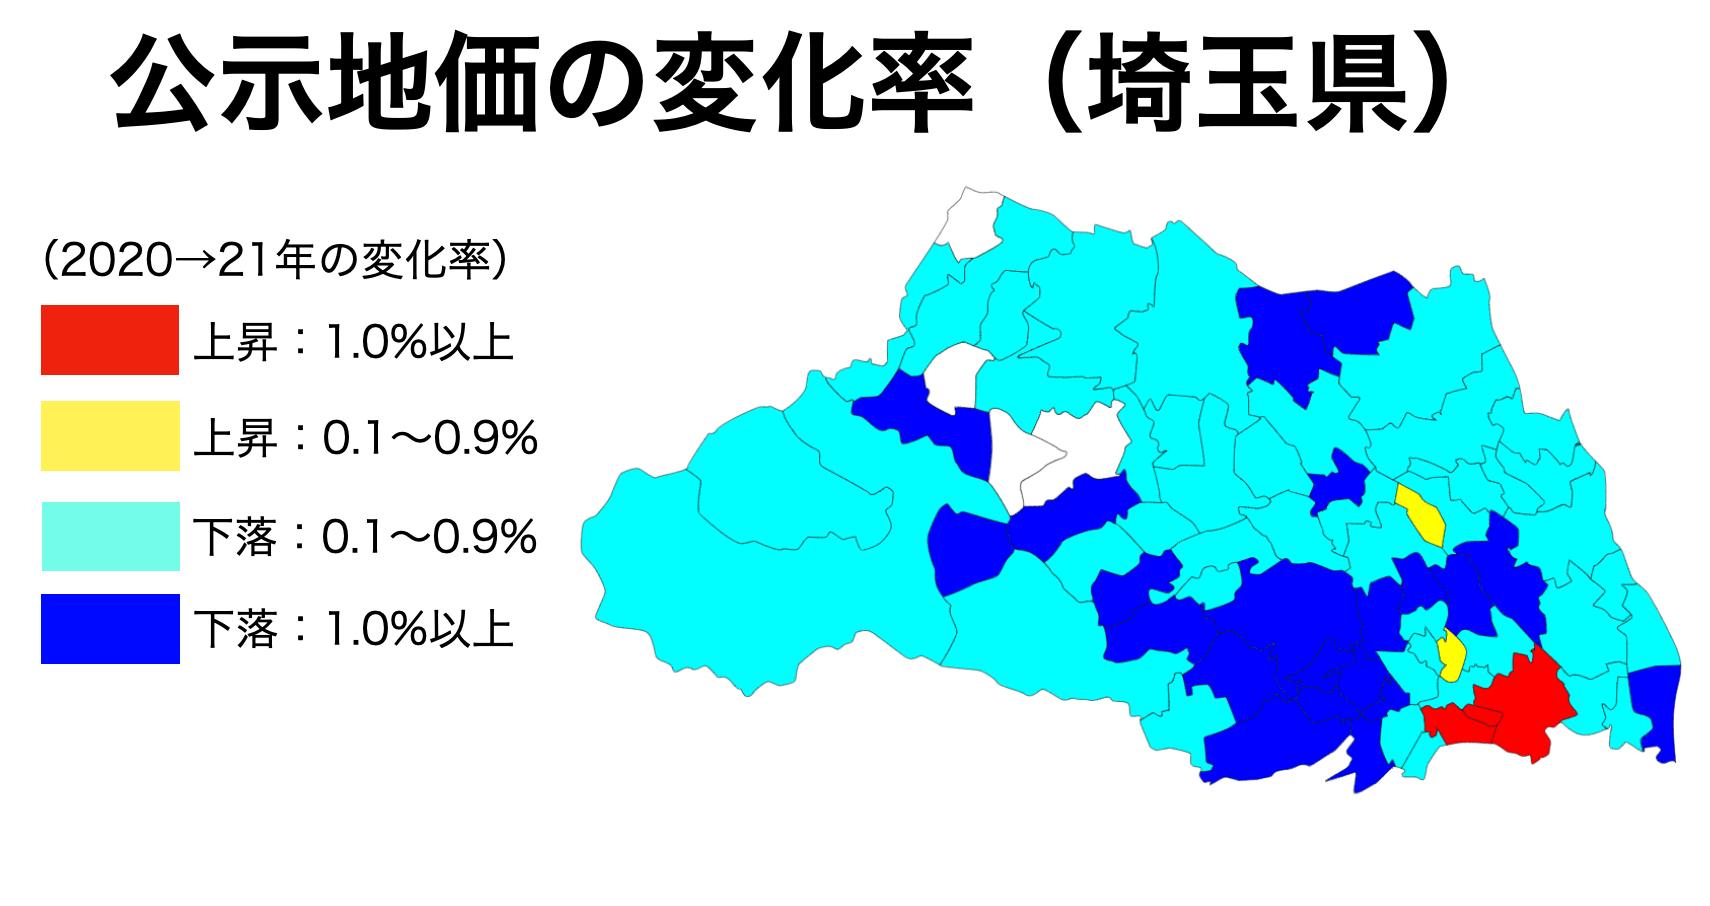 埼玉県の公示地価の変化率